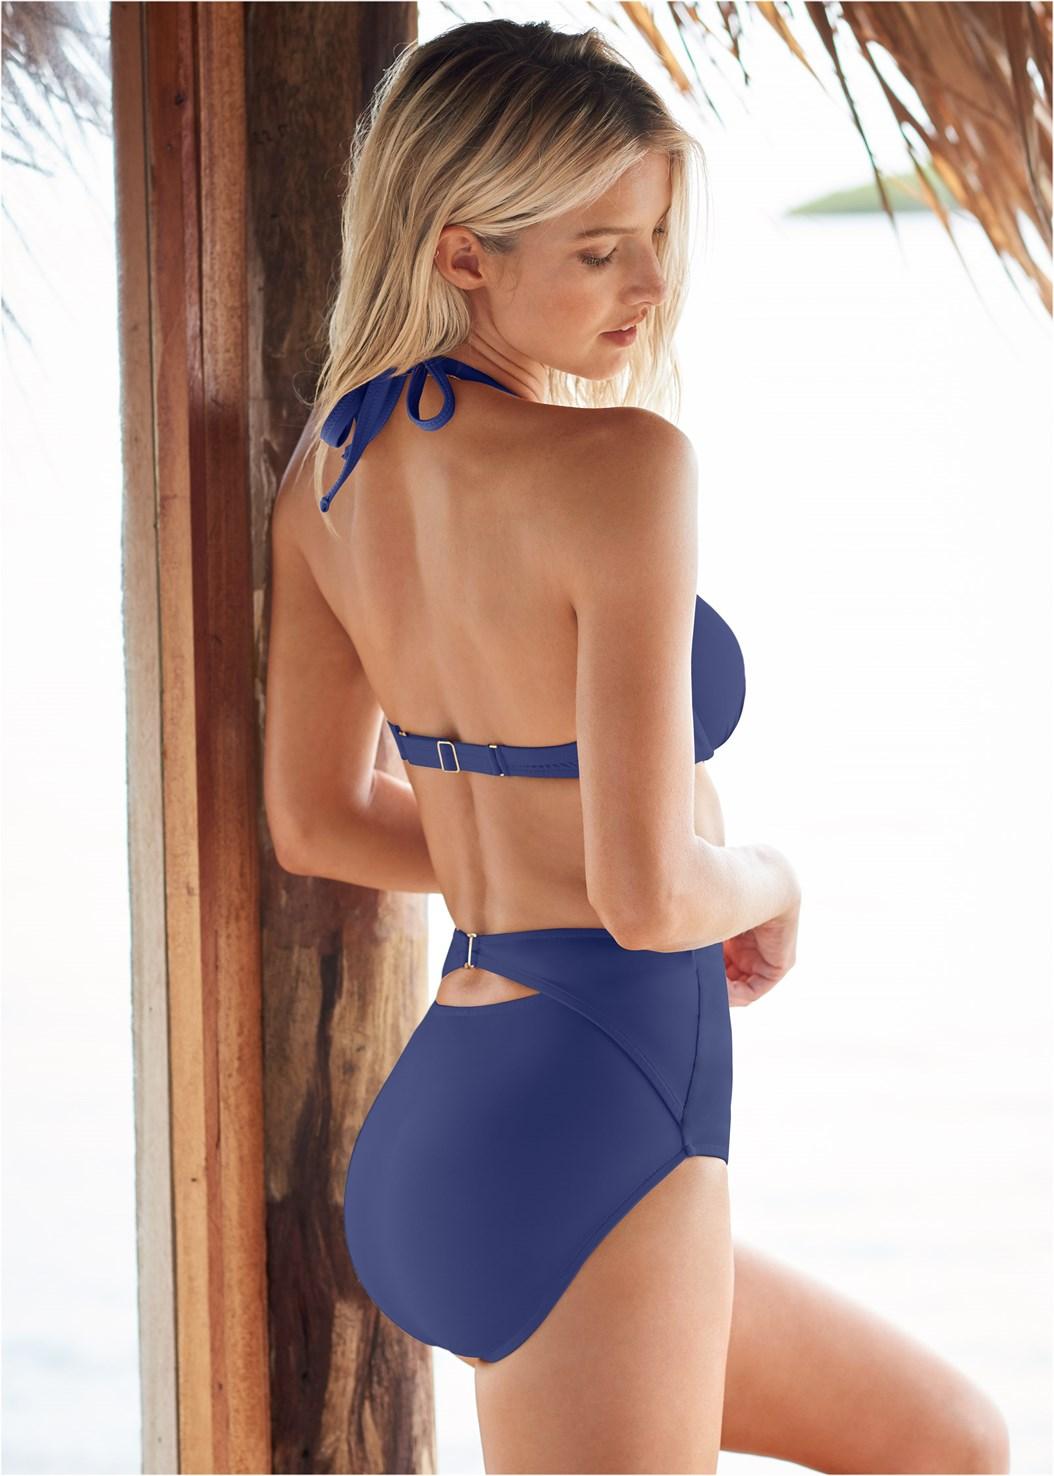 High Waist Keyhole Bottom,Venus Enhancer Halter Top,Lace Up Enhancer,Triangle String Bikini Top,Maxi Cover-Up Dress